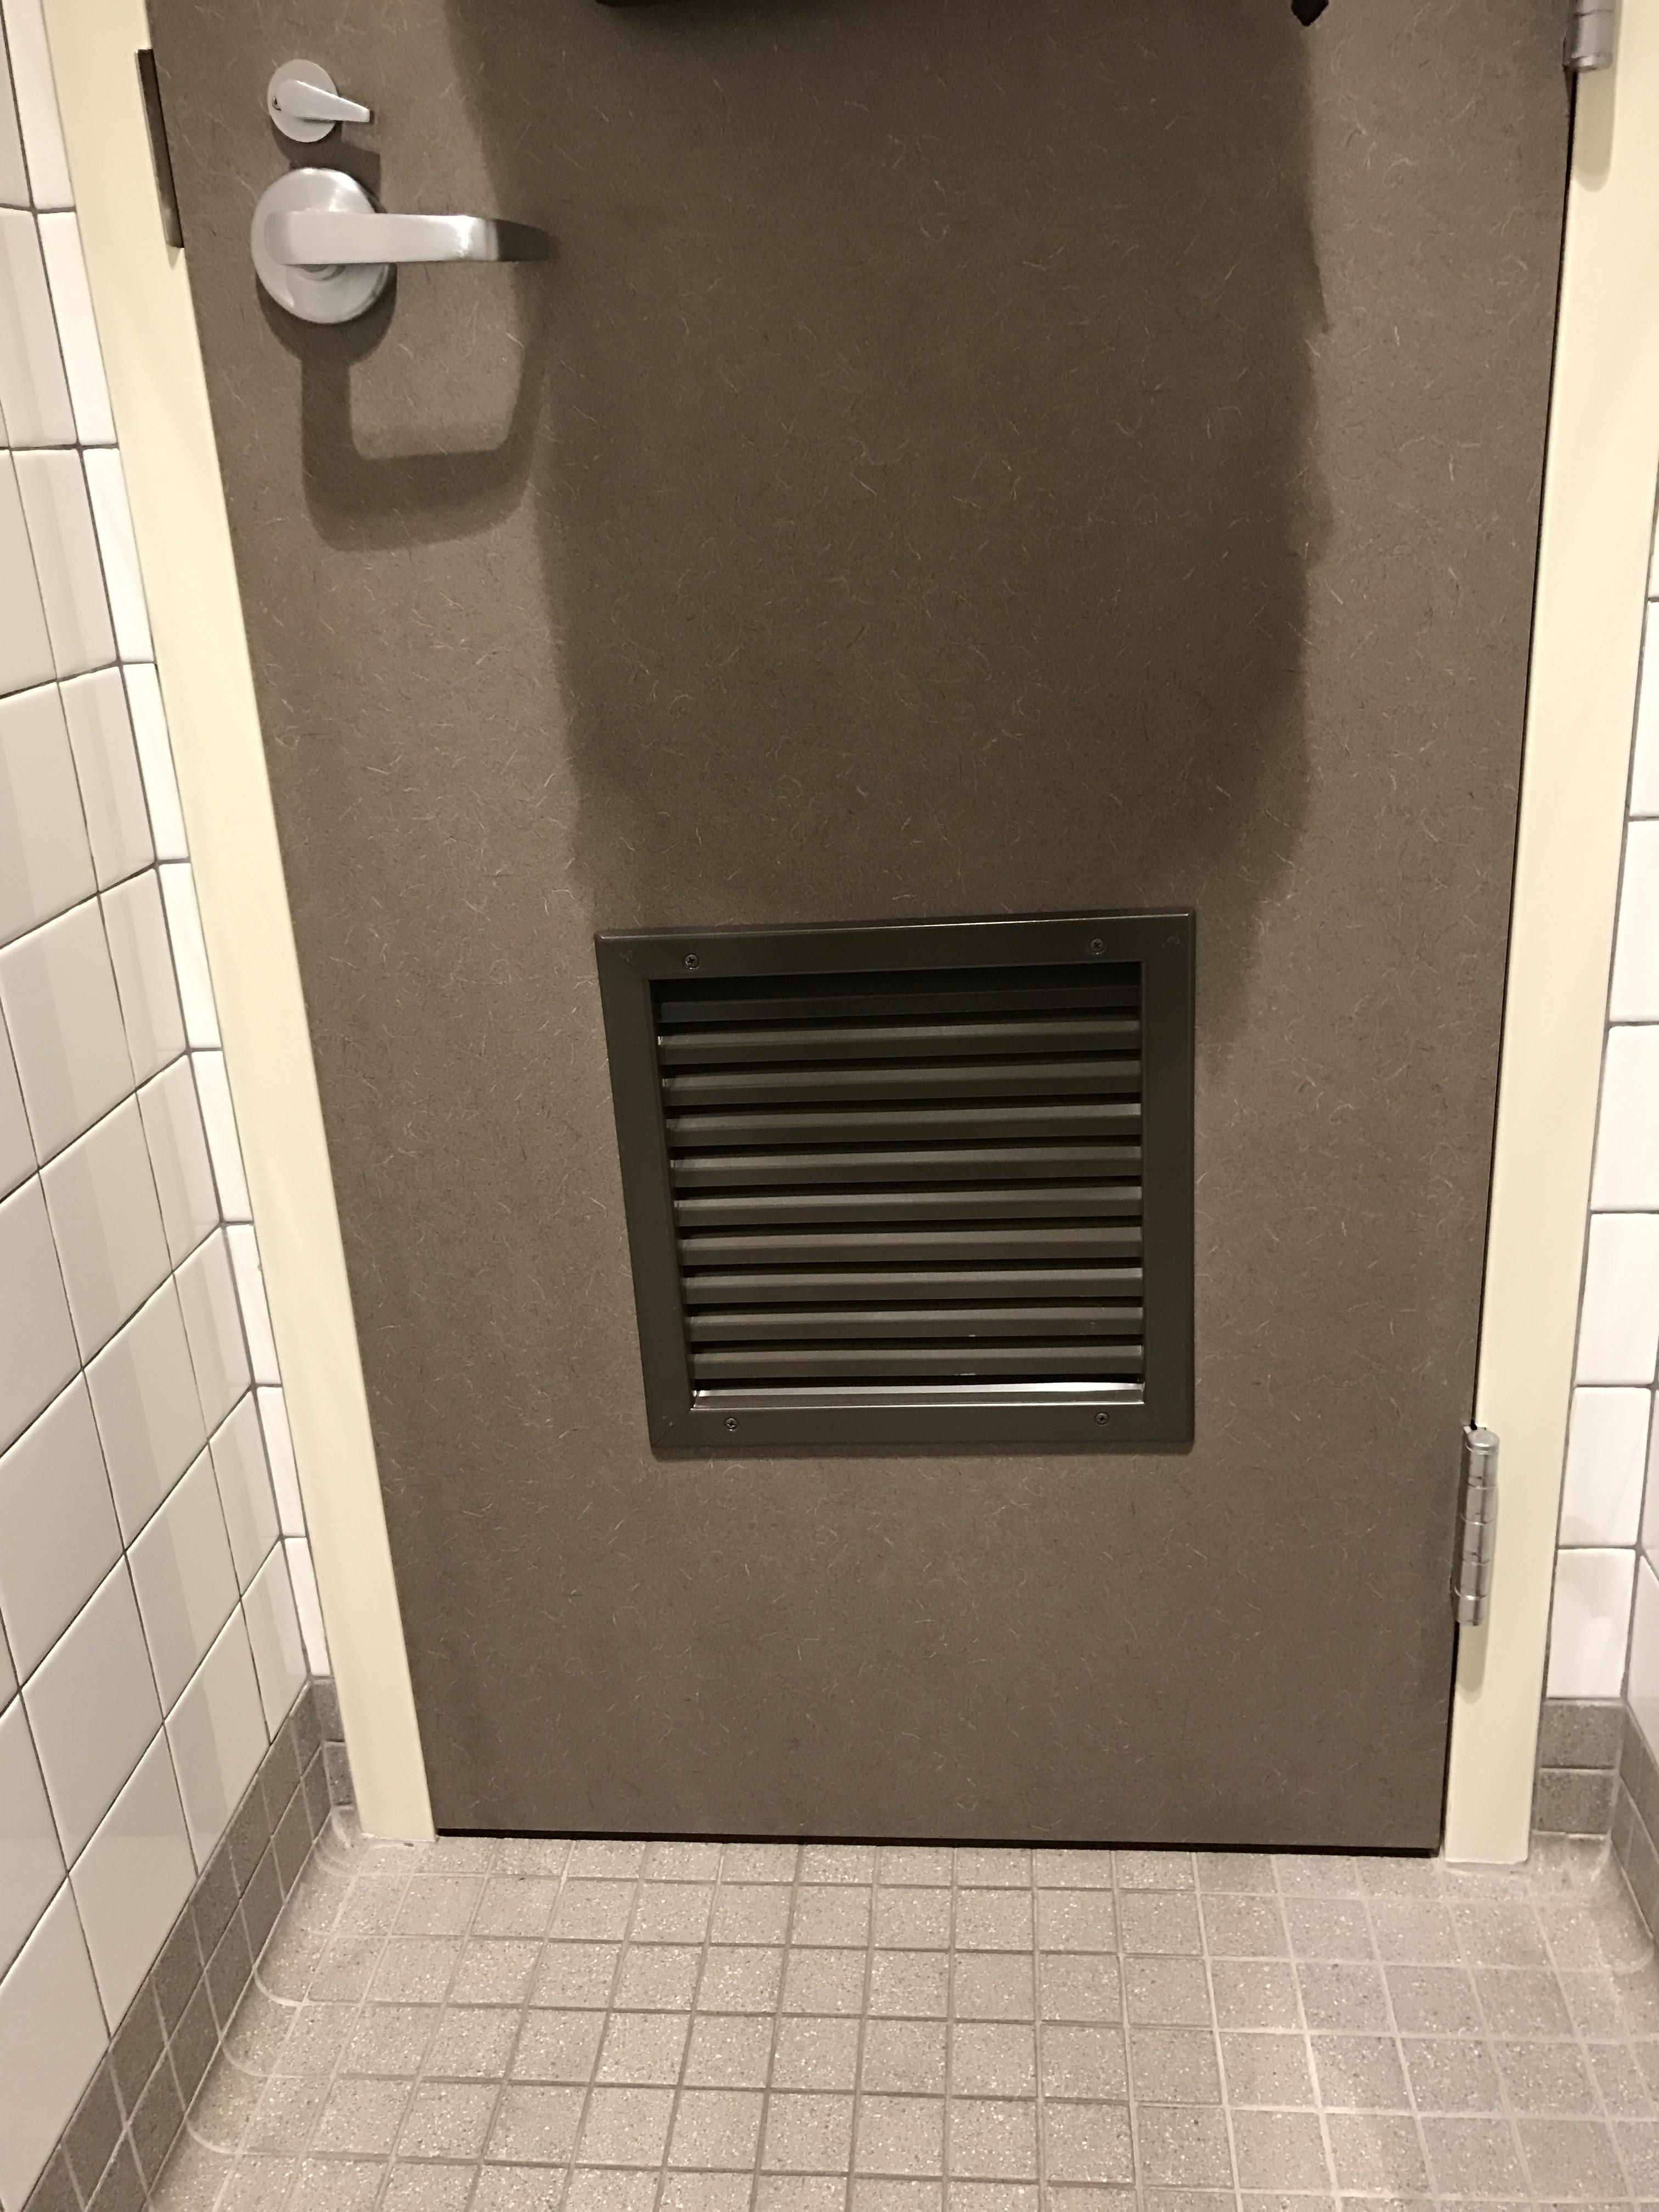 I Used UC Berkeleys New Multistall Genderinclusive Bathroom - Floor to ceiling bathroom stalls